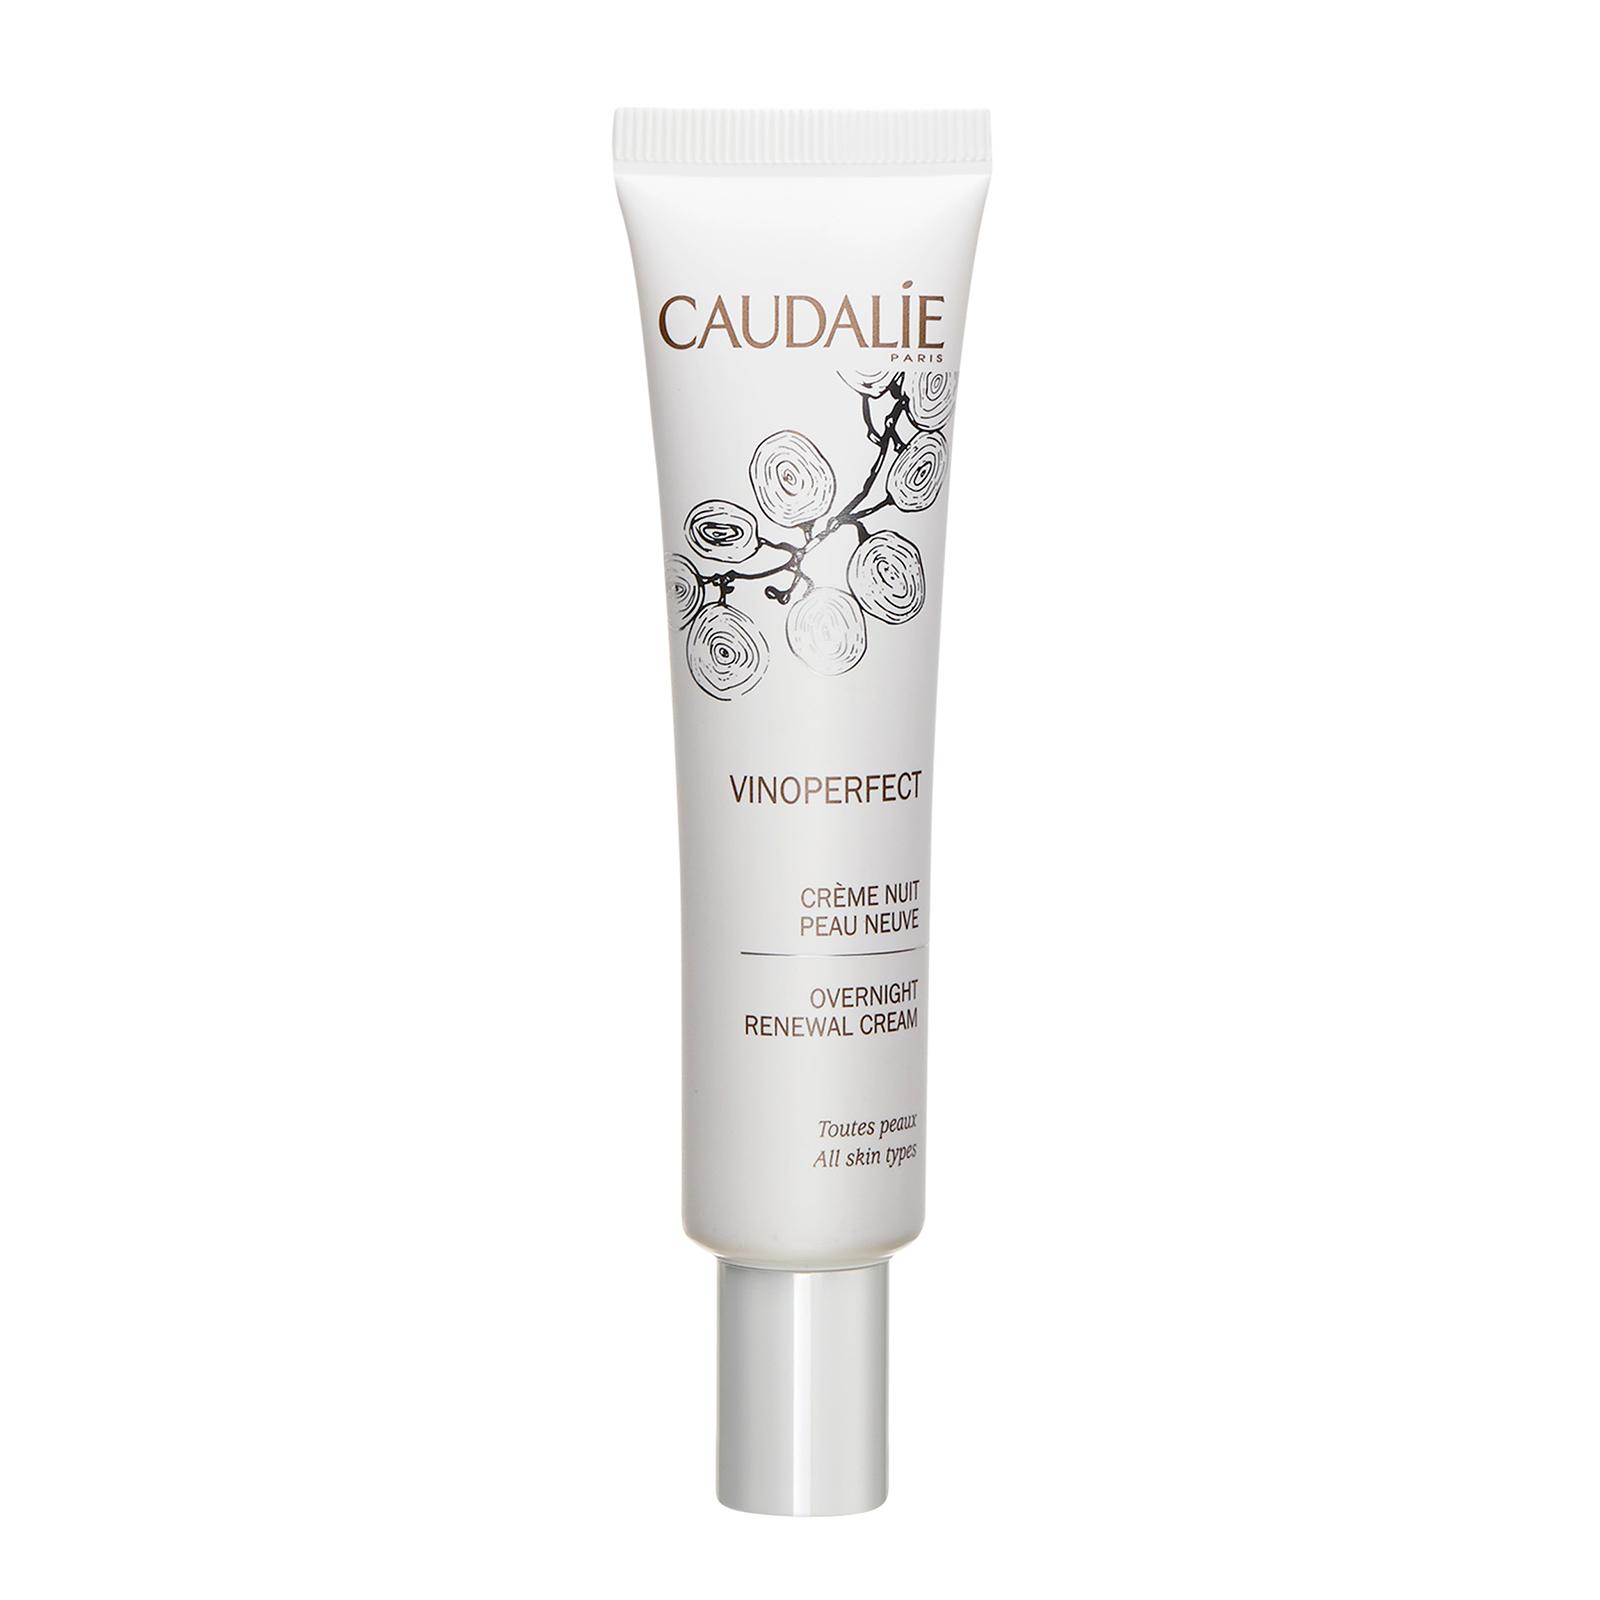 CAUDALIE Vinoperfect Overnight Renewal Cream (All Skin Types)  1.3oz, 40ml